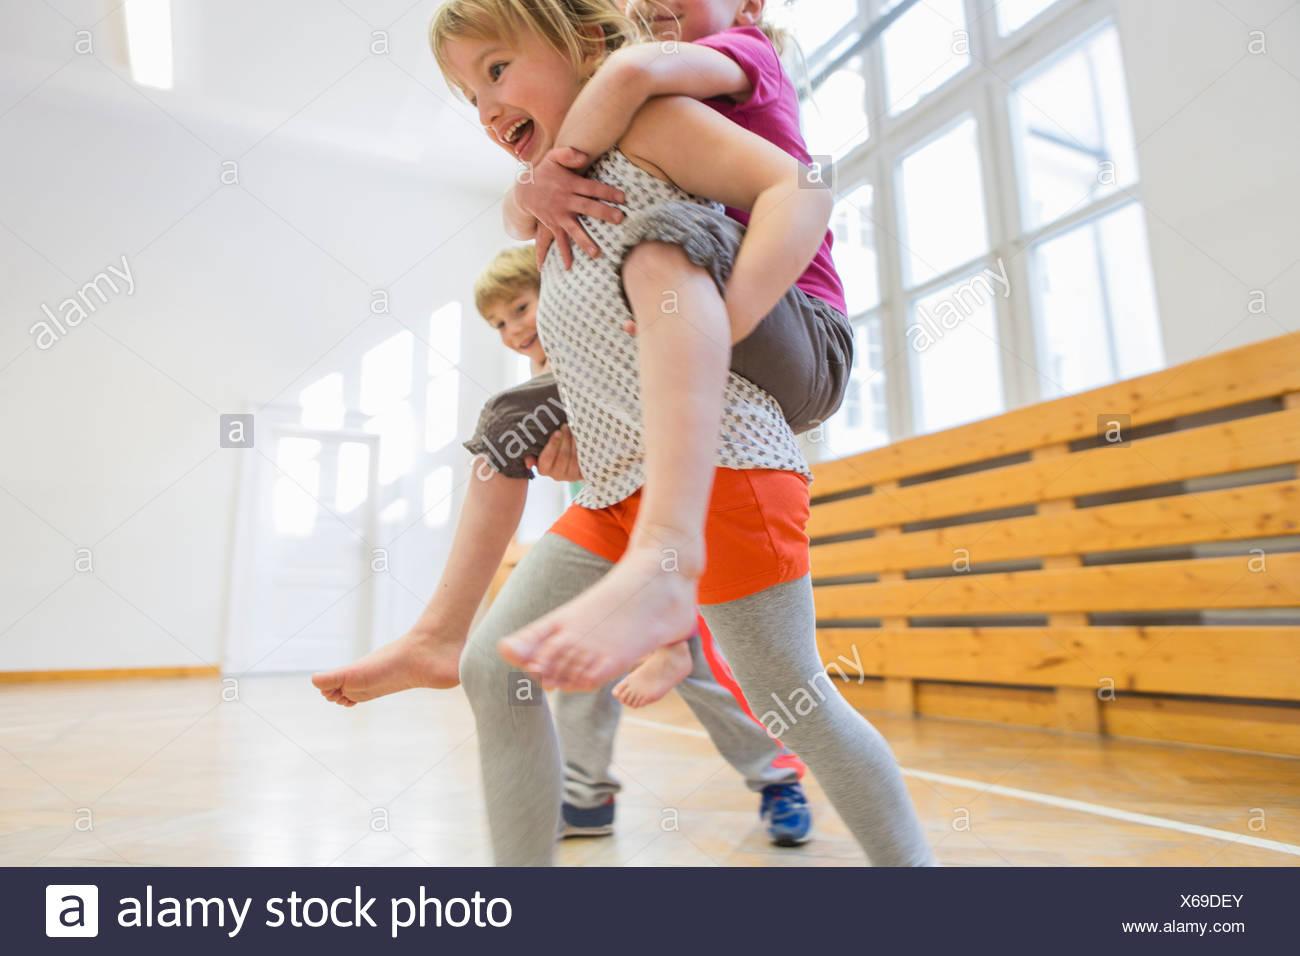 Los niños que piggy back carrera en sala escolar Foto de stock